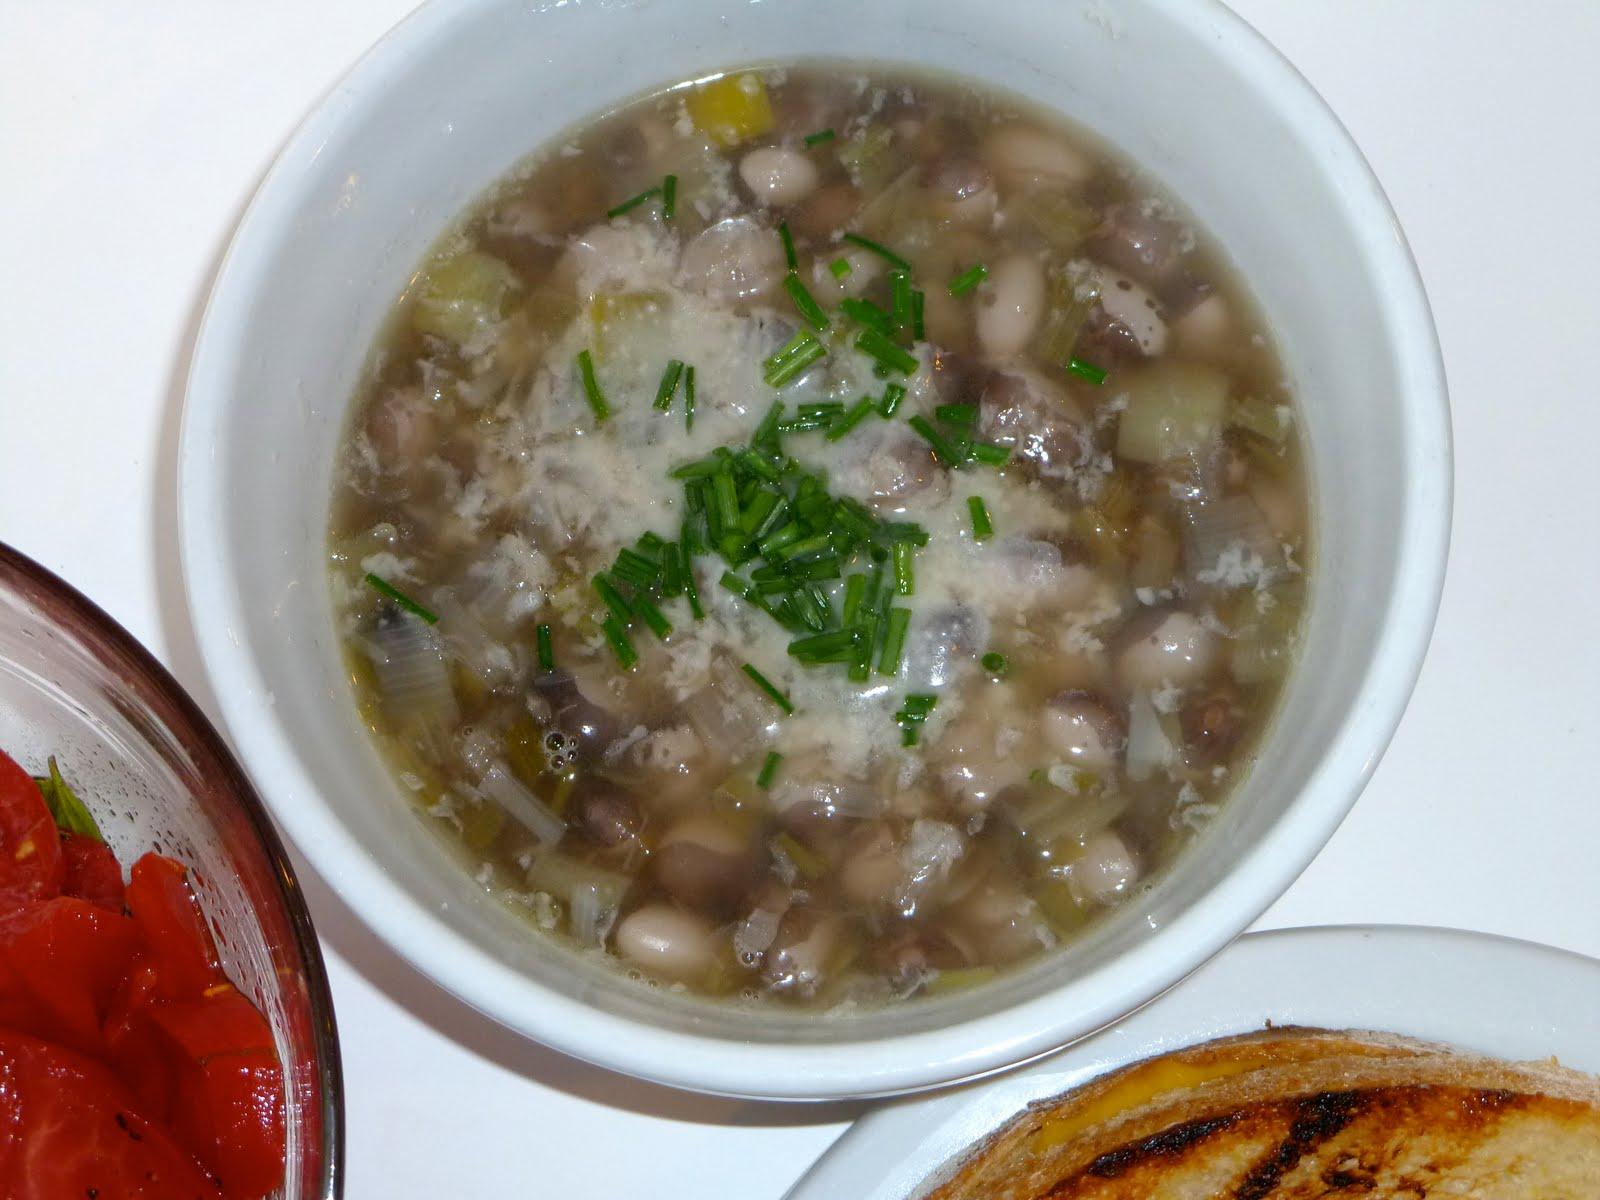 Fairmount Neighborhood Farmers Market: Calypso Bean Soup